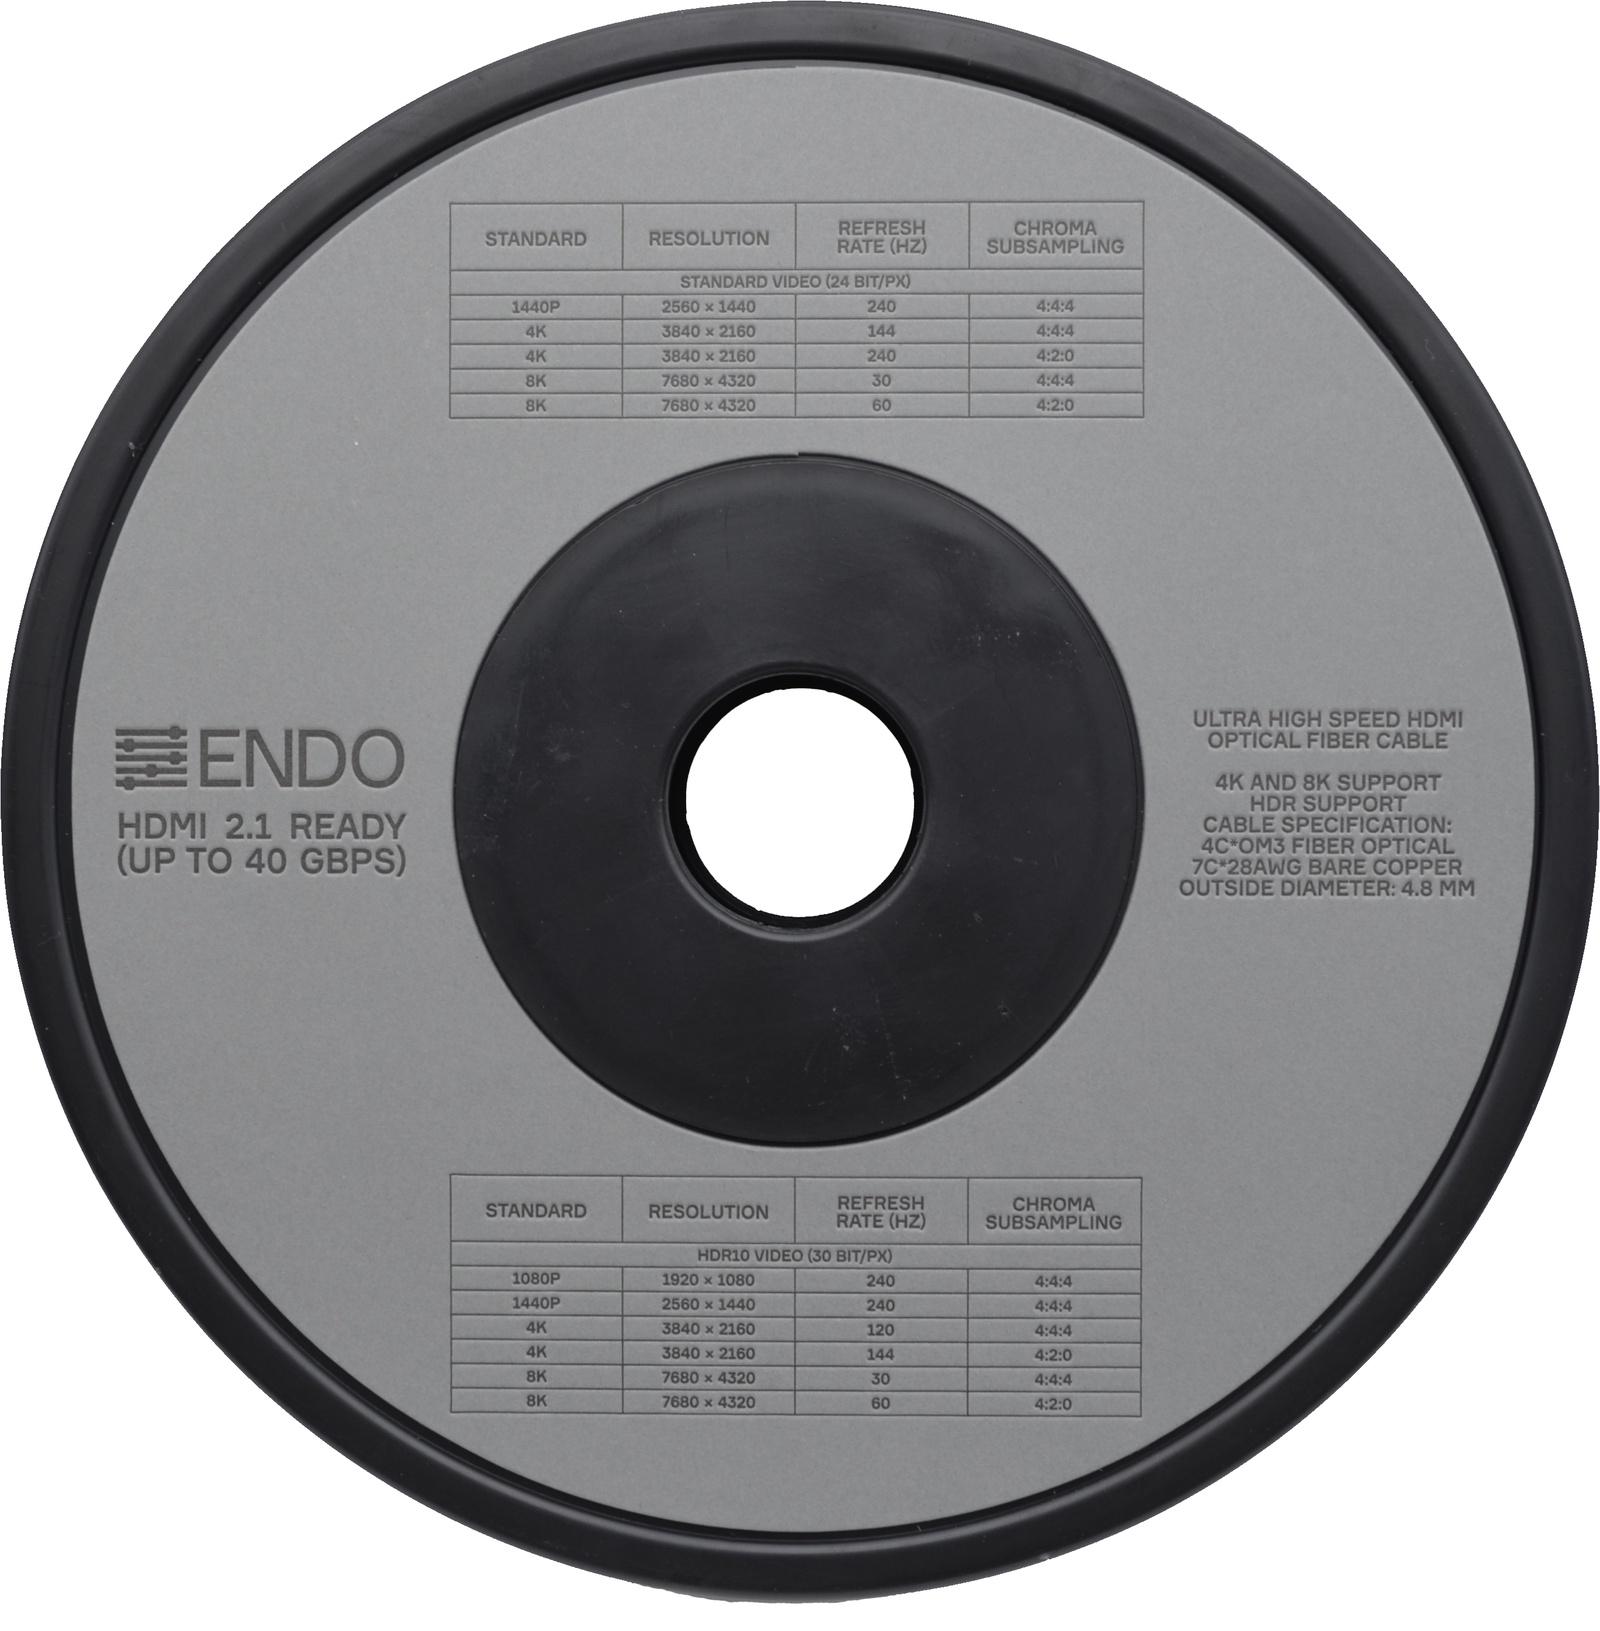 Кабель ENDO Inspiration HDMI - micro-HDMI/HDMI 2.1 READY 80 м valentine s day love pattern waterproof table cloth